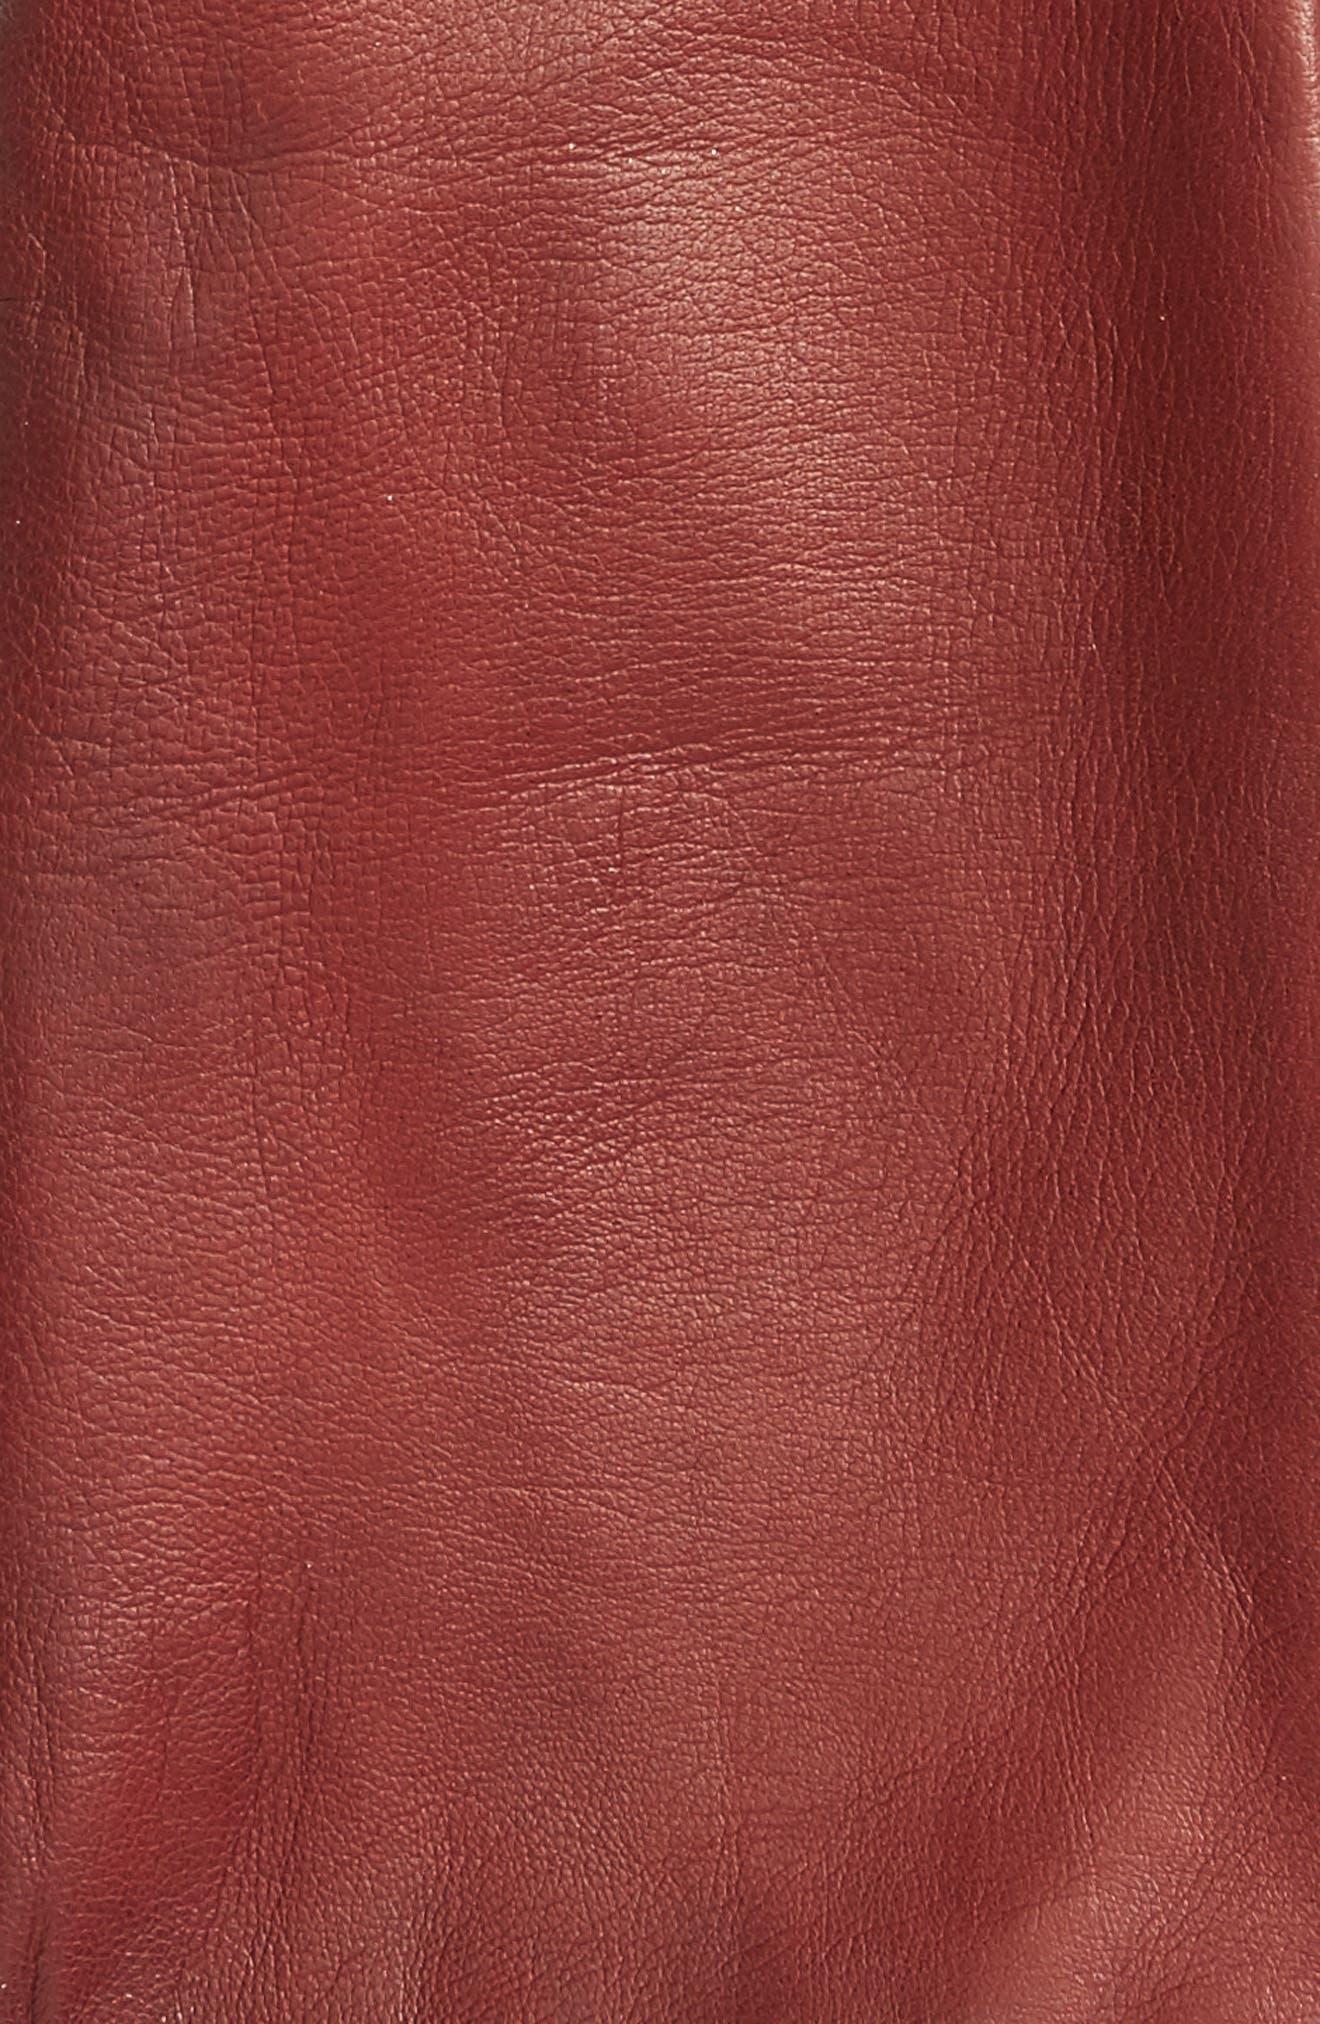 Long Leather Gloves,                             Alternate thumbnail 4, color,